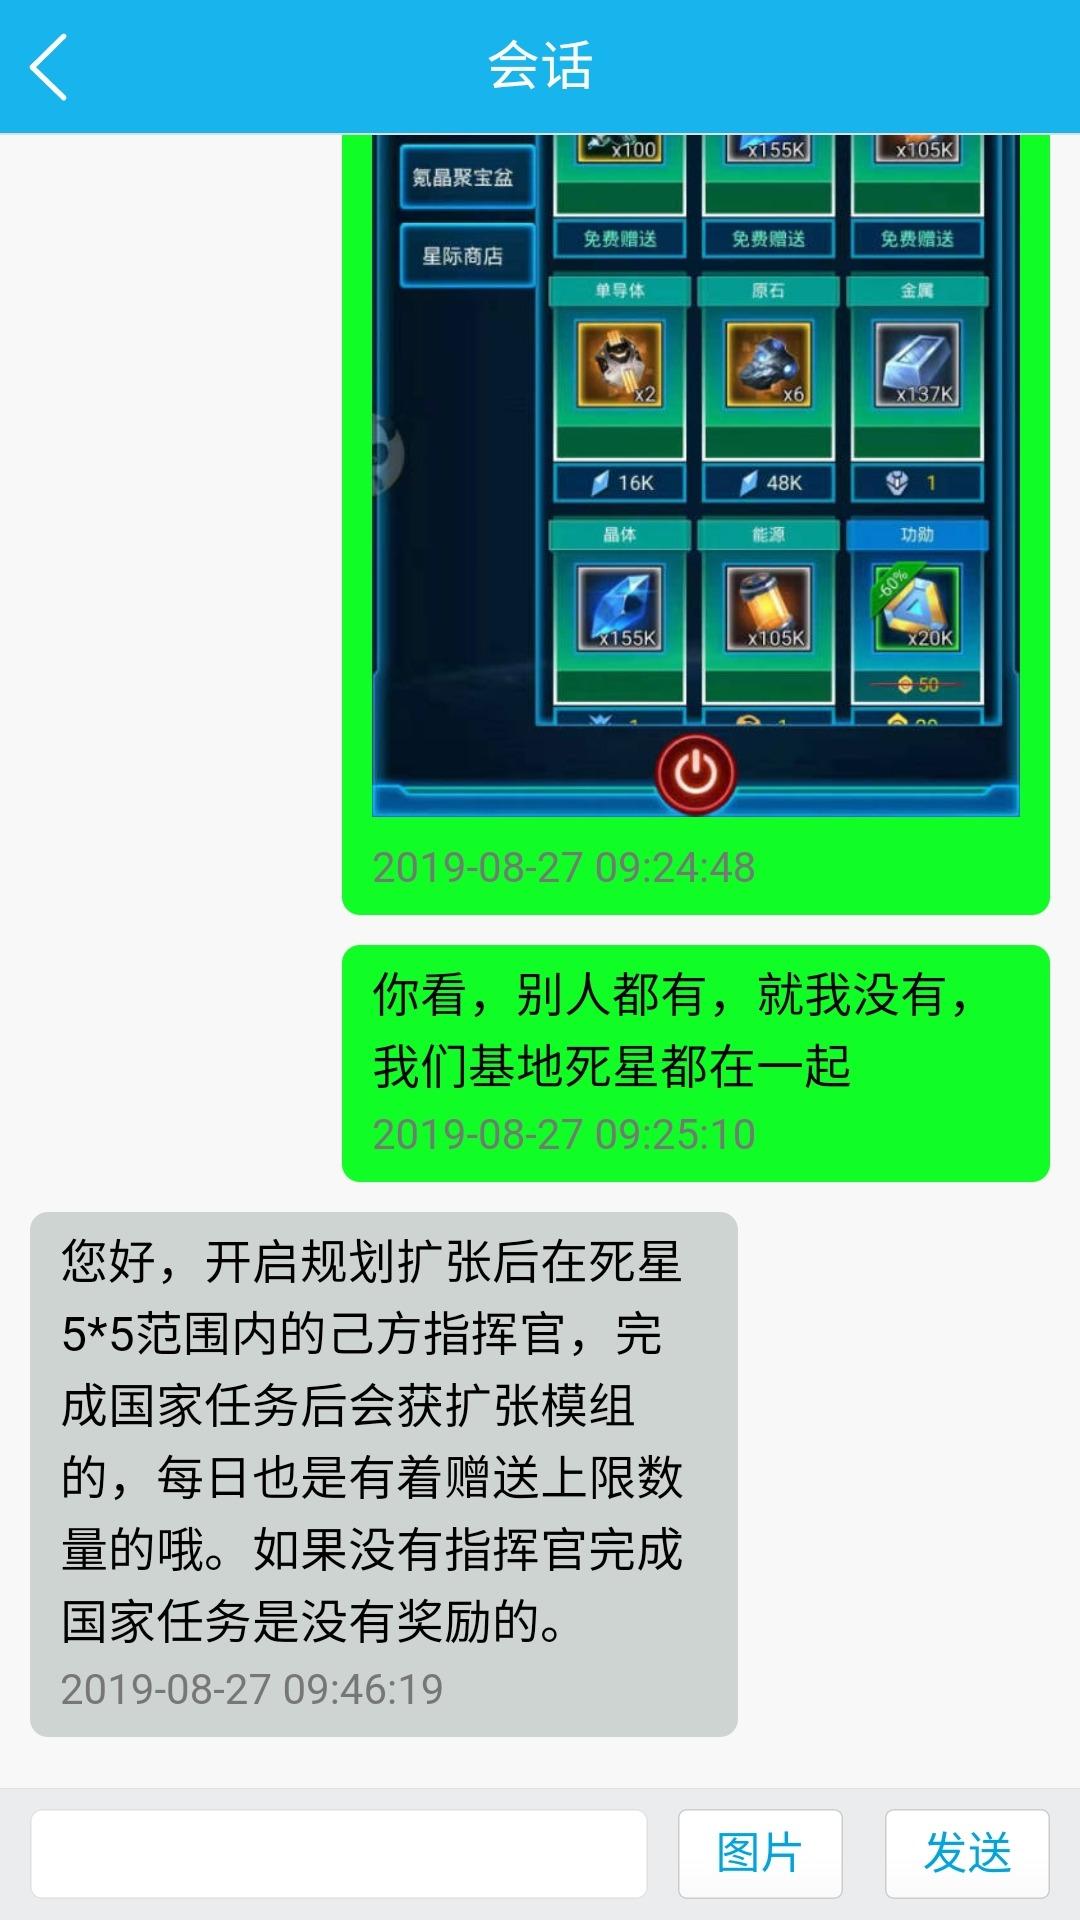 Screenshot_20190827_105358_com.jedigames.p16s.luobo.jpg